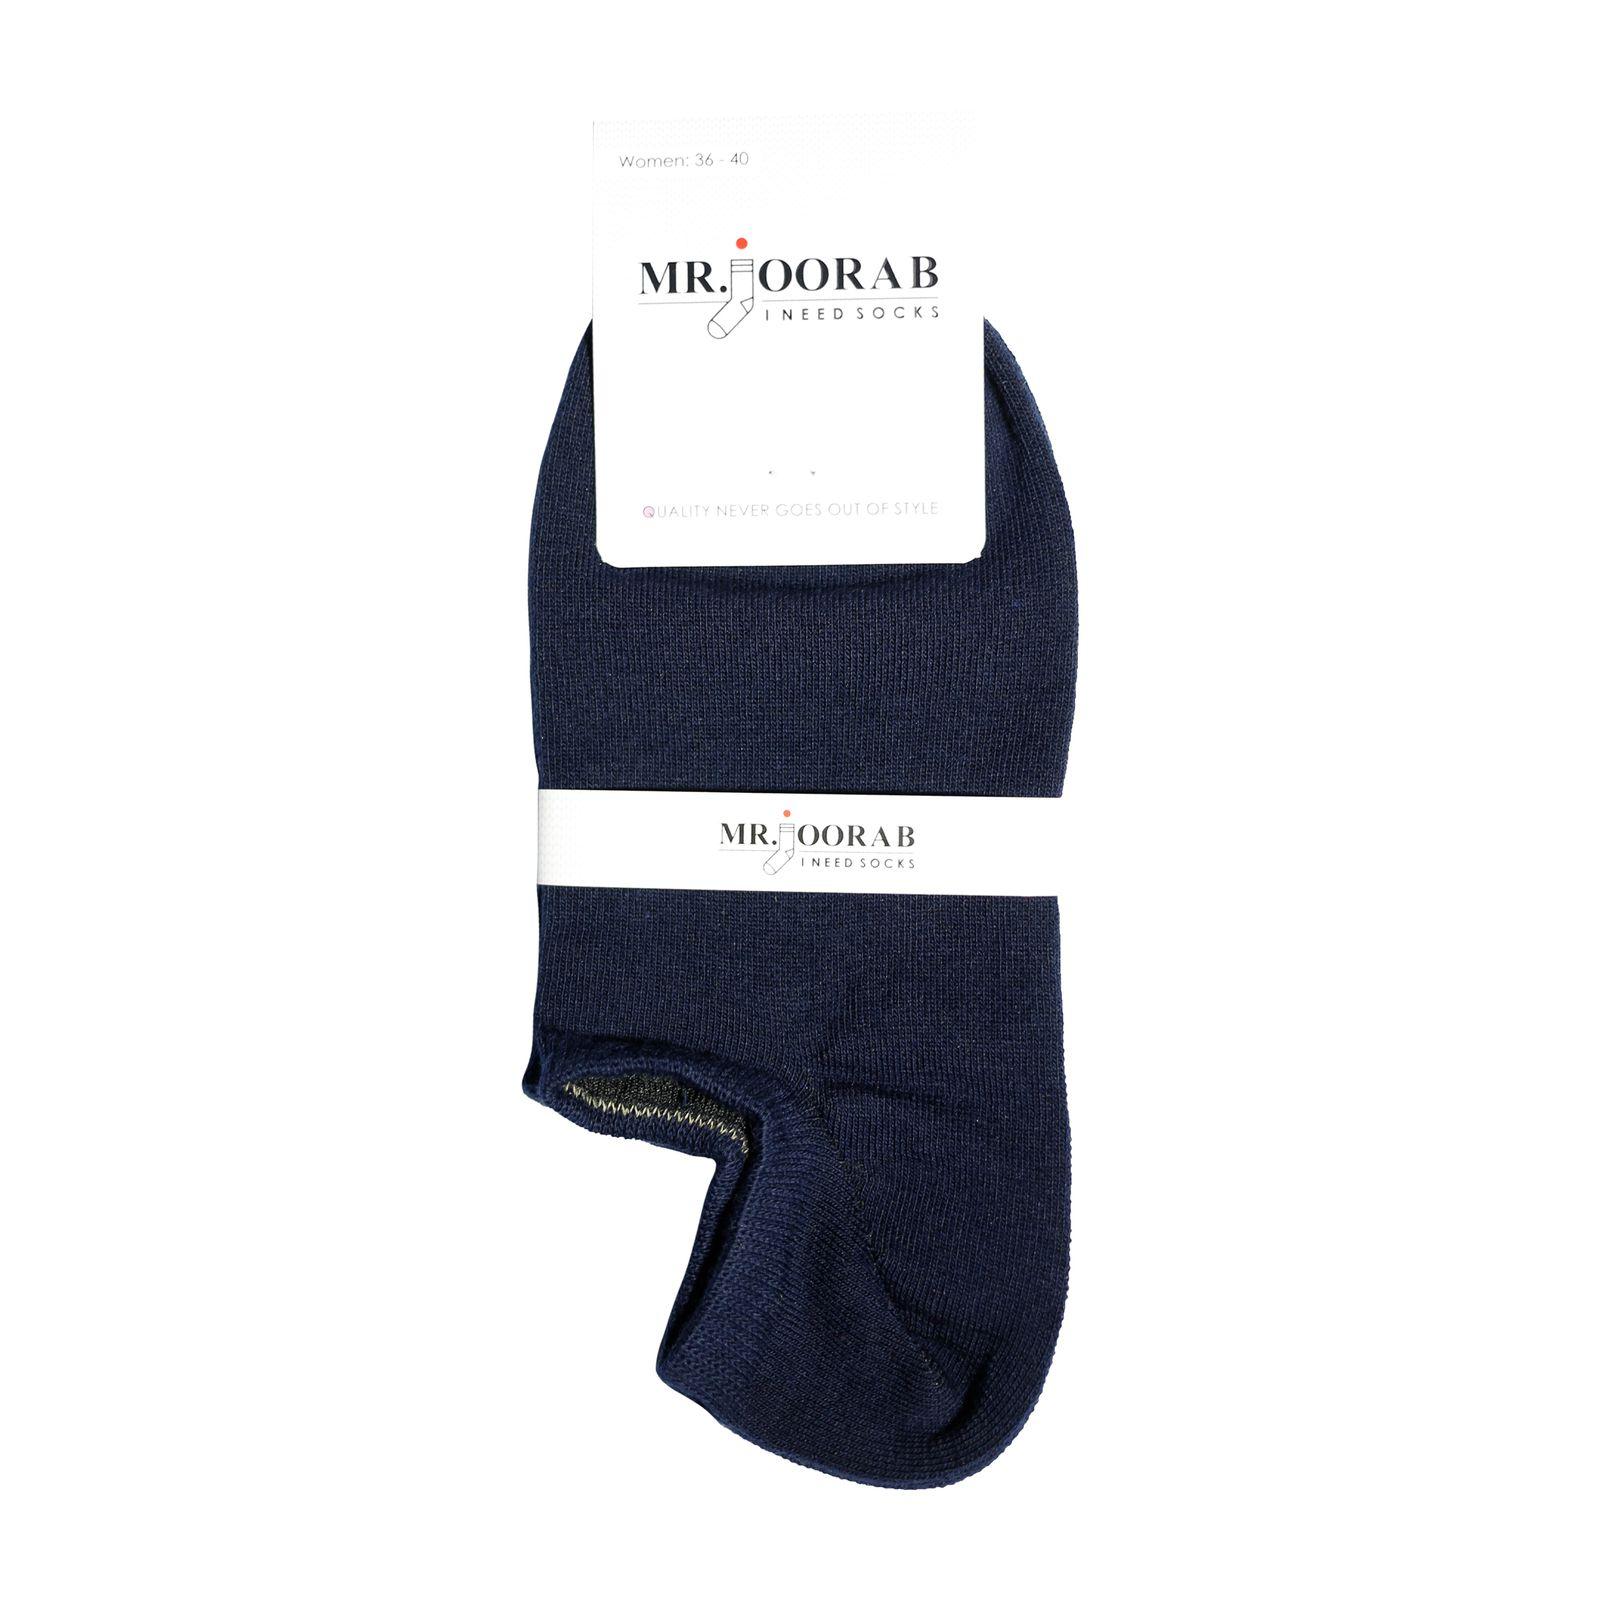 جوراب زنانه مستر جوراب کد BL-MRM 218 مجموعه 6 عددی -  - 4